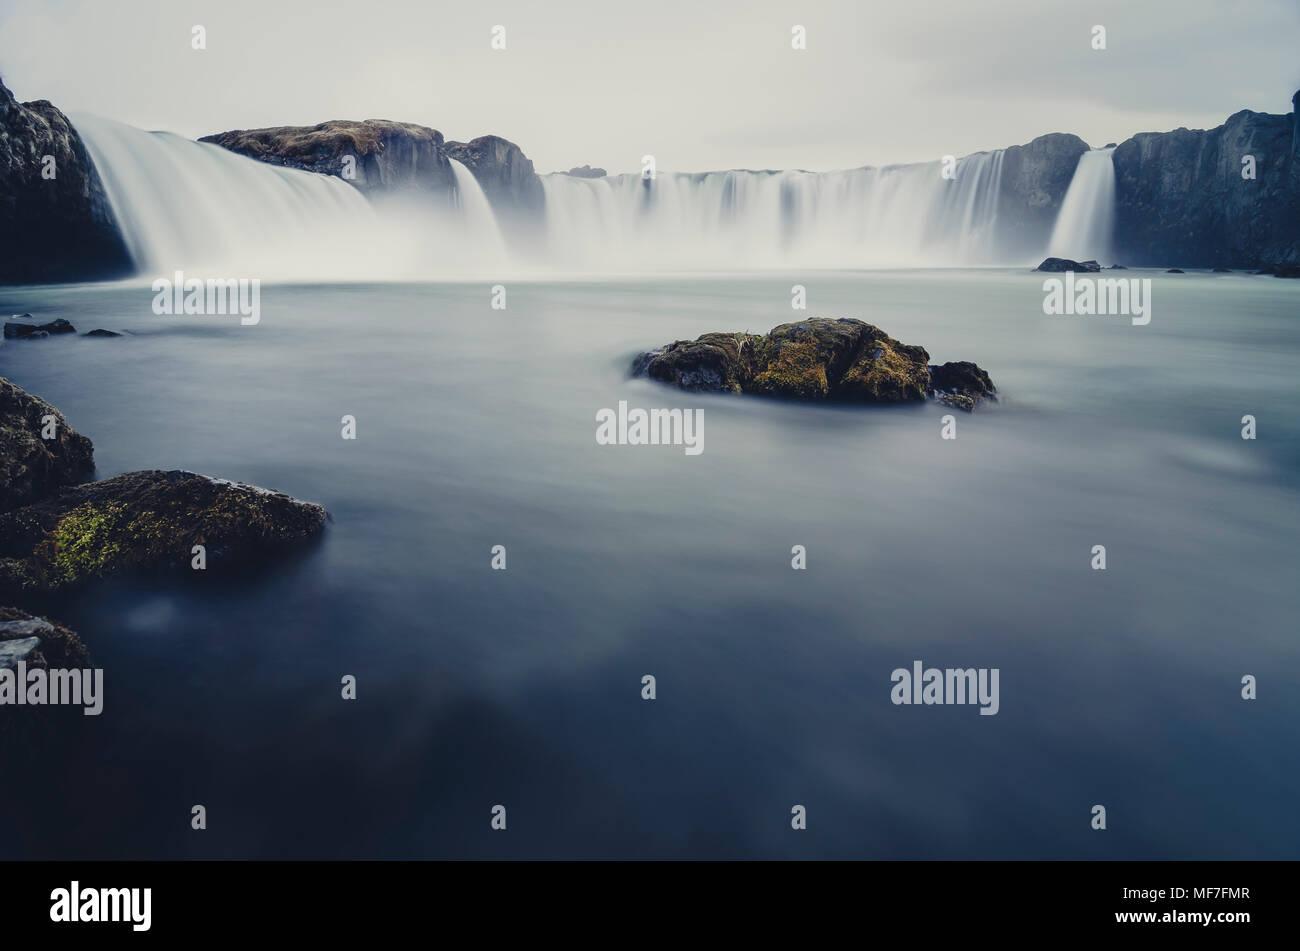 Iceland, Godafoss Waterfall - Stock Image